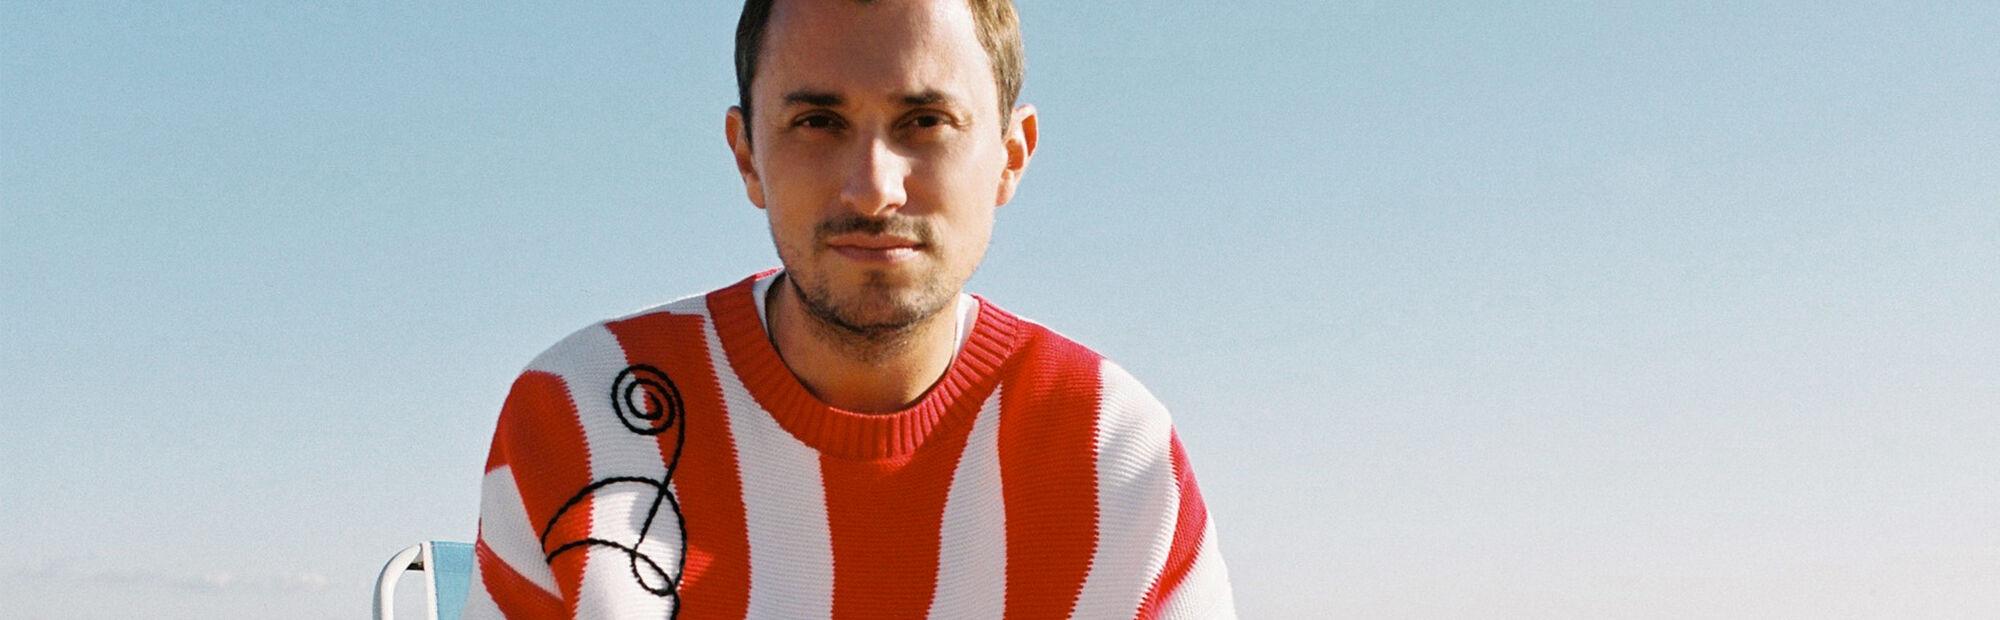 Desigual and Colombian Designer Esteban Cortázar Announce Their Collaboration